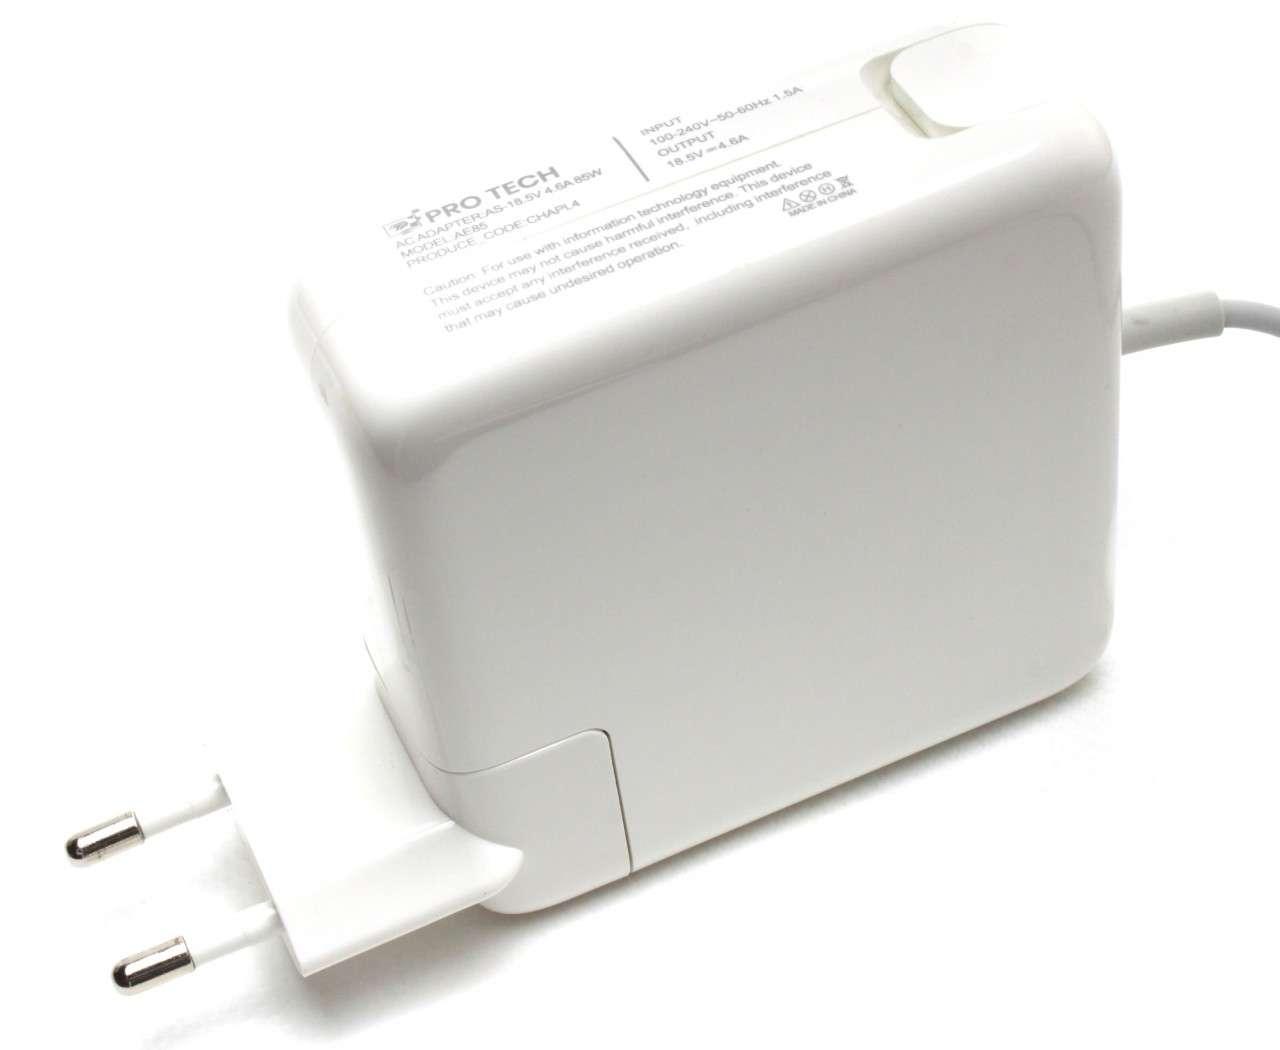 Incarcator Apple A1290 85W Replacement imagine powerlaptop.ro 2021